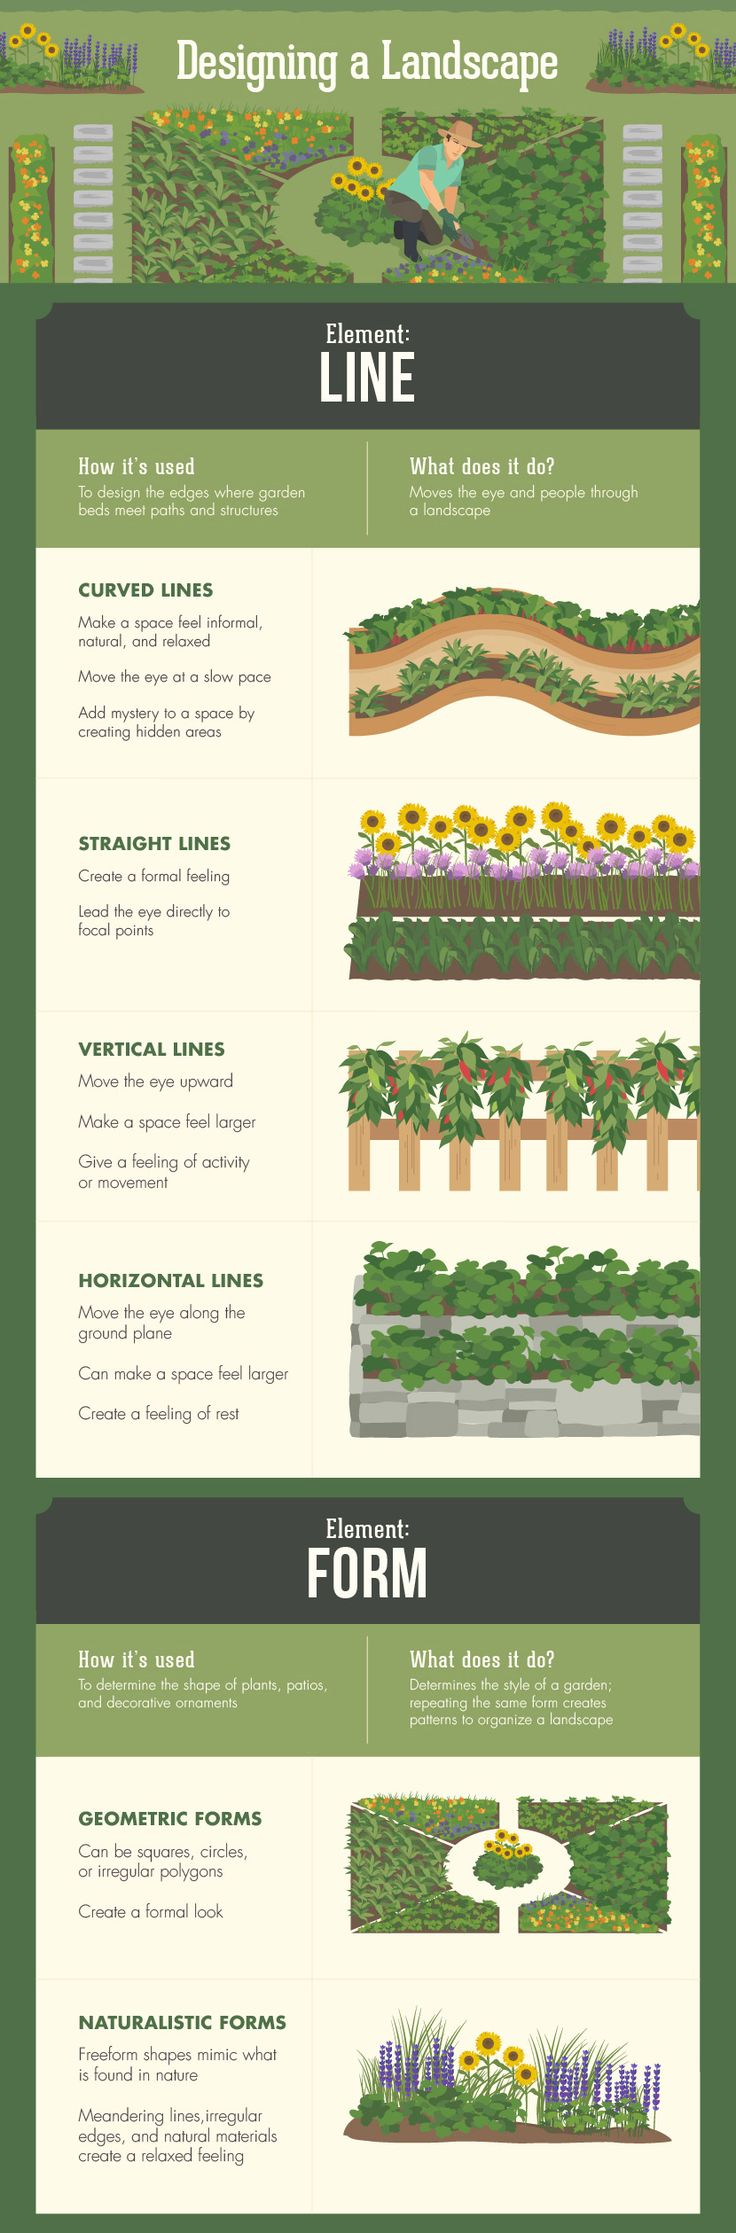 Creative environments landscape co edible gardens - 167 Best Edible Landscaping Companion Planting Images On Pinterest Edible Garden Gardening And Veggie Gardens